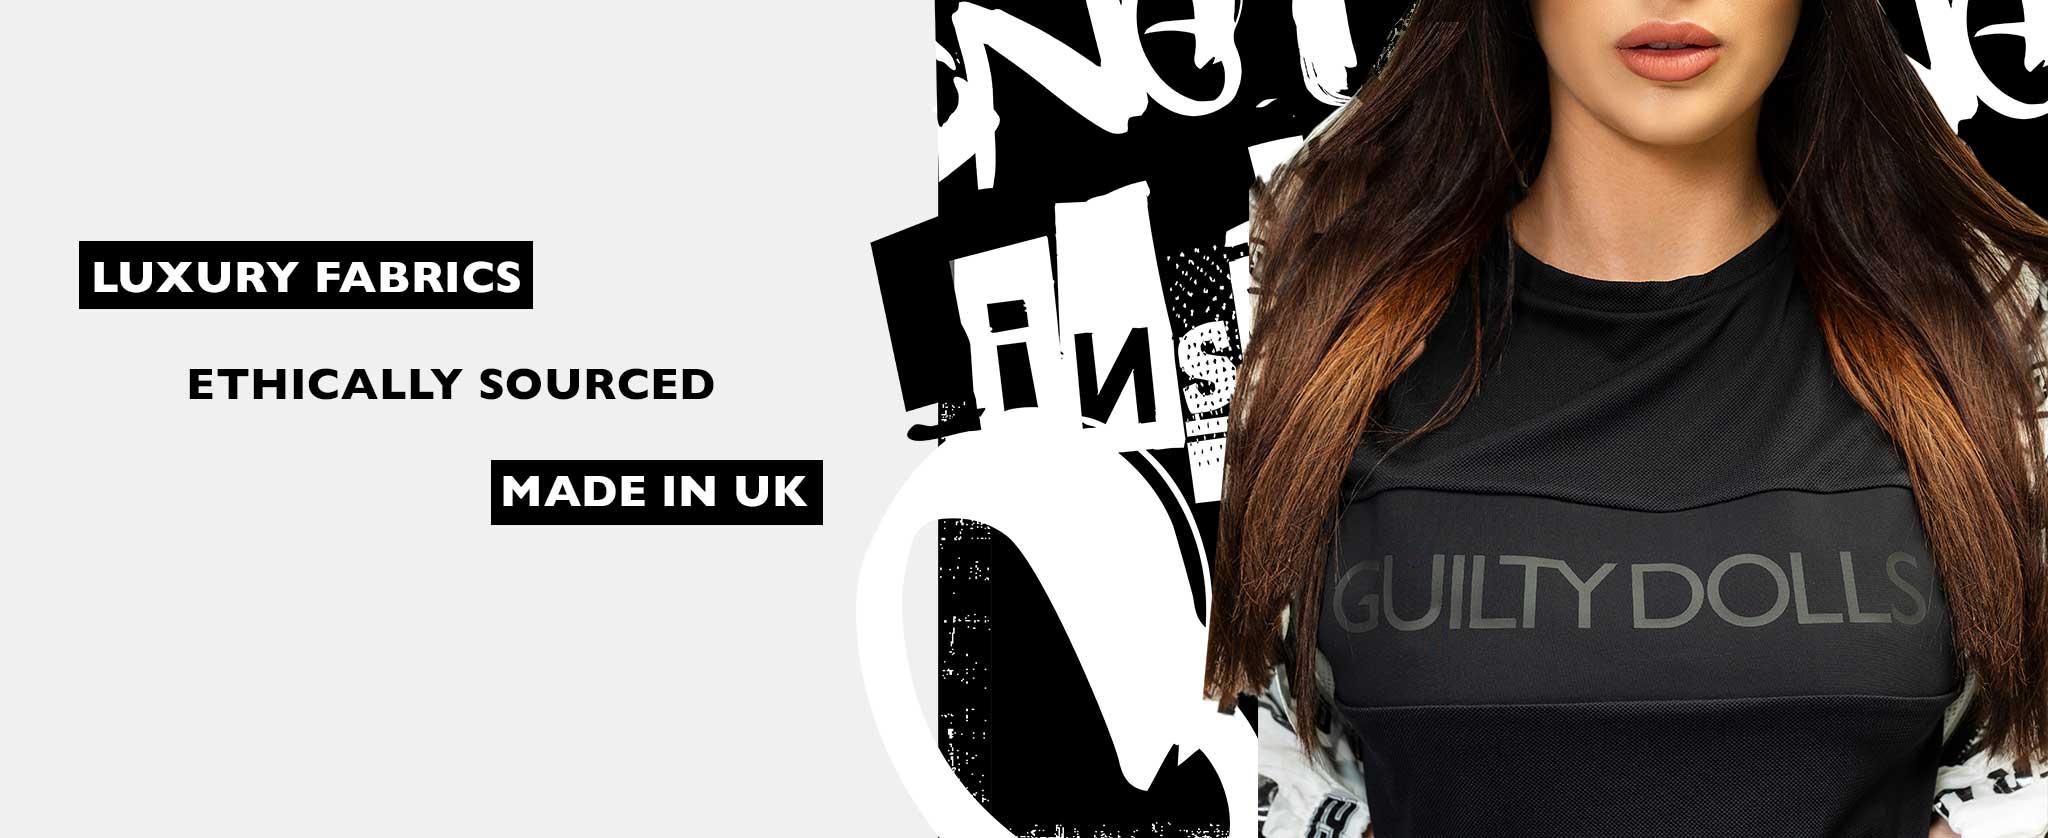 Guilty Dolls London | Activewear | Luxury Premium Leisurewear